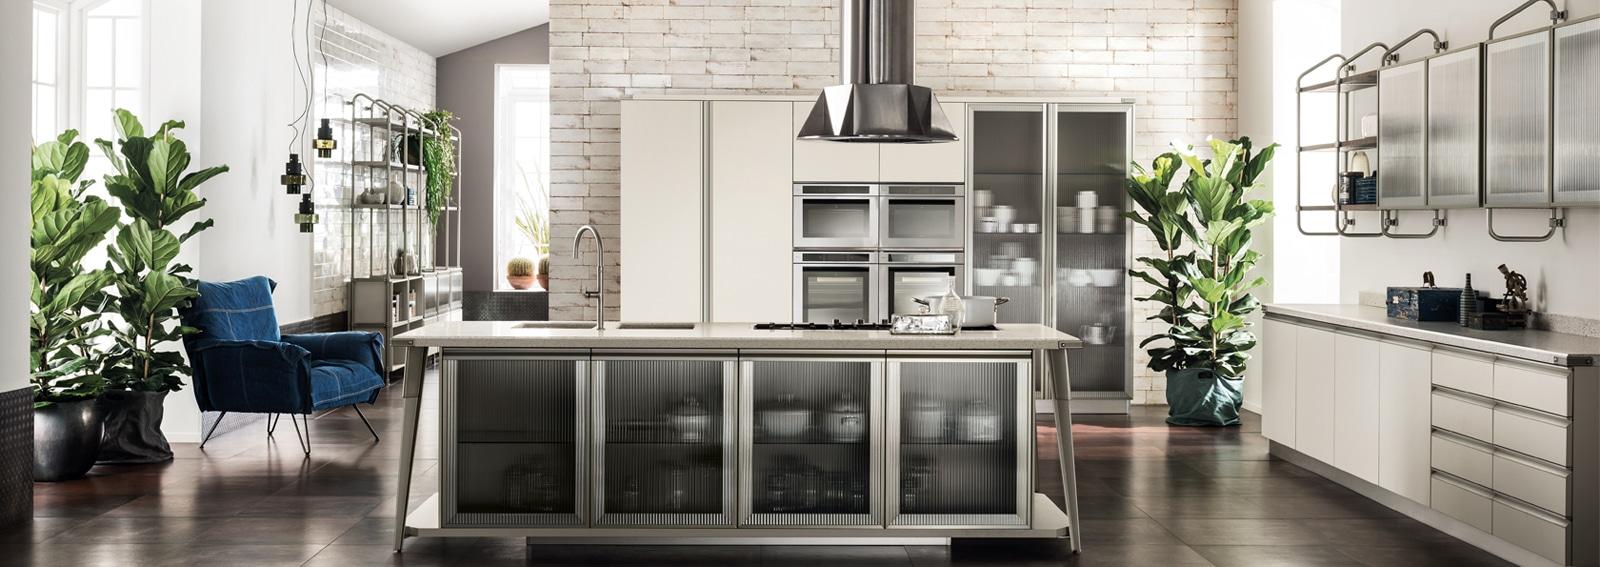 cover-cucina-in-ordine-desktop